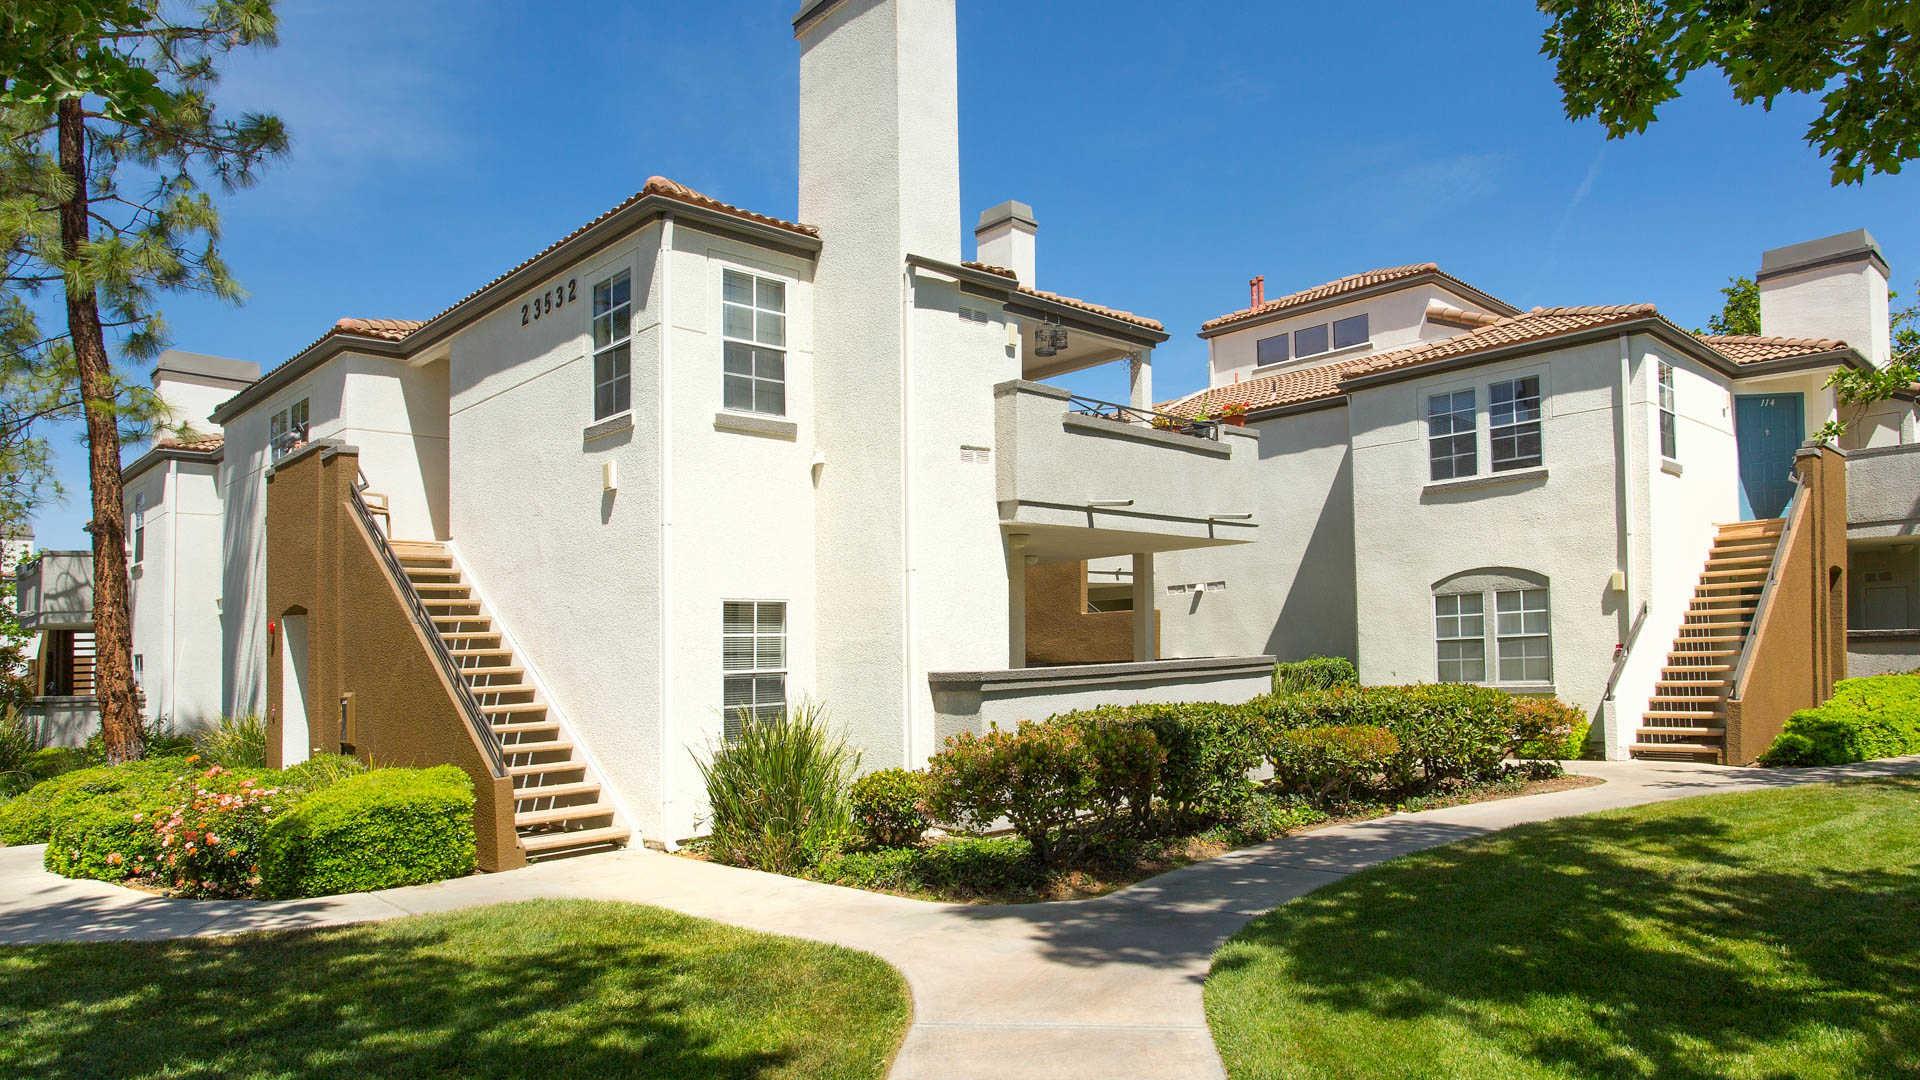 Apartments Near CalArts Northglen for California Institute of the Arts Students in Valencia, CA